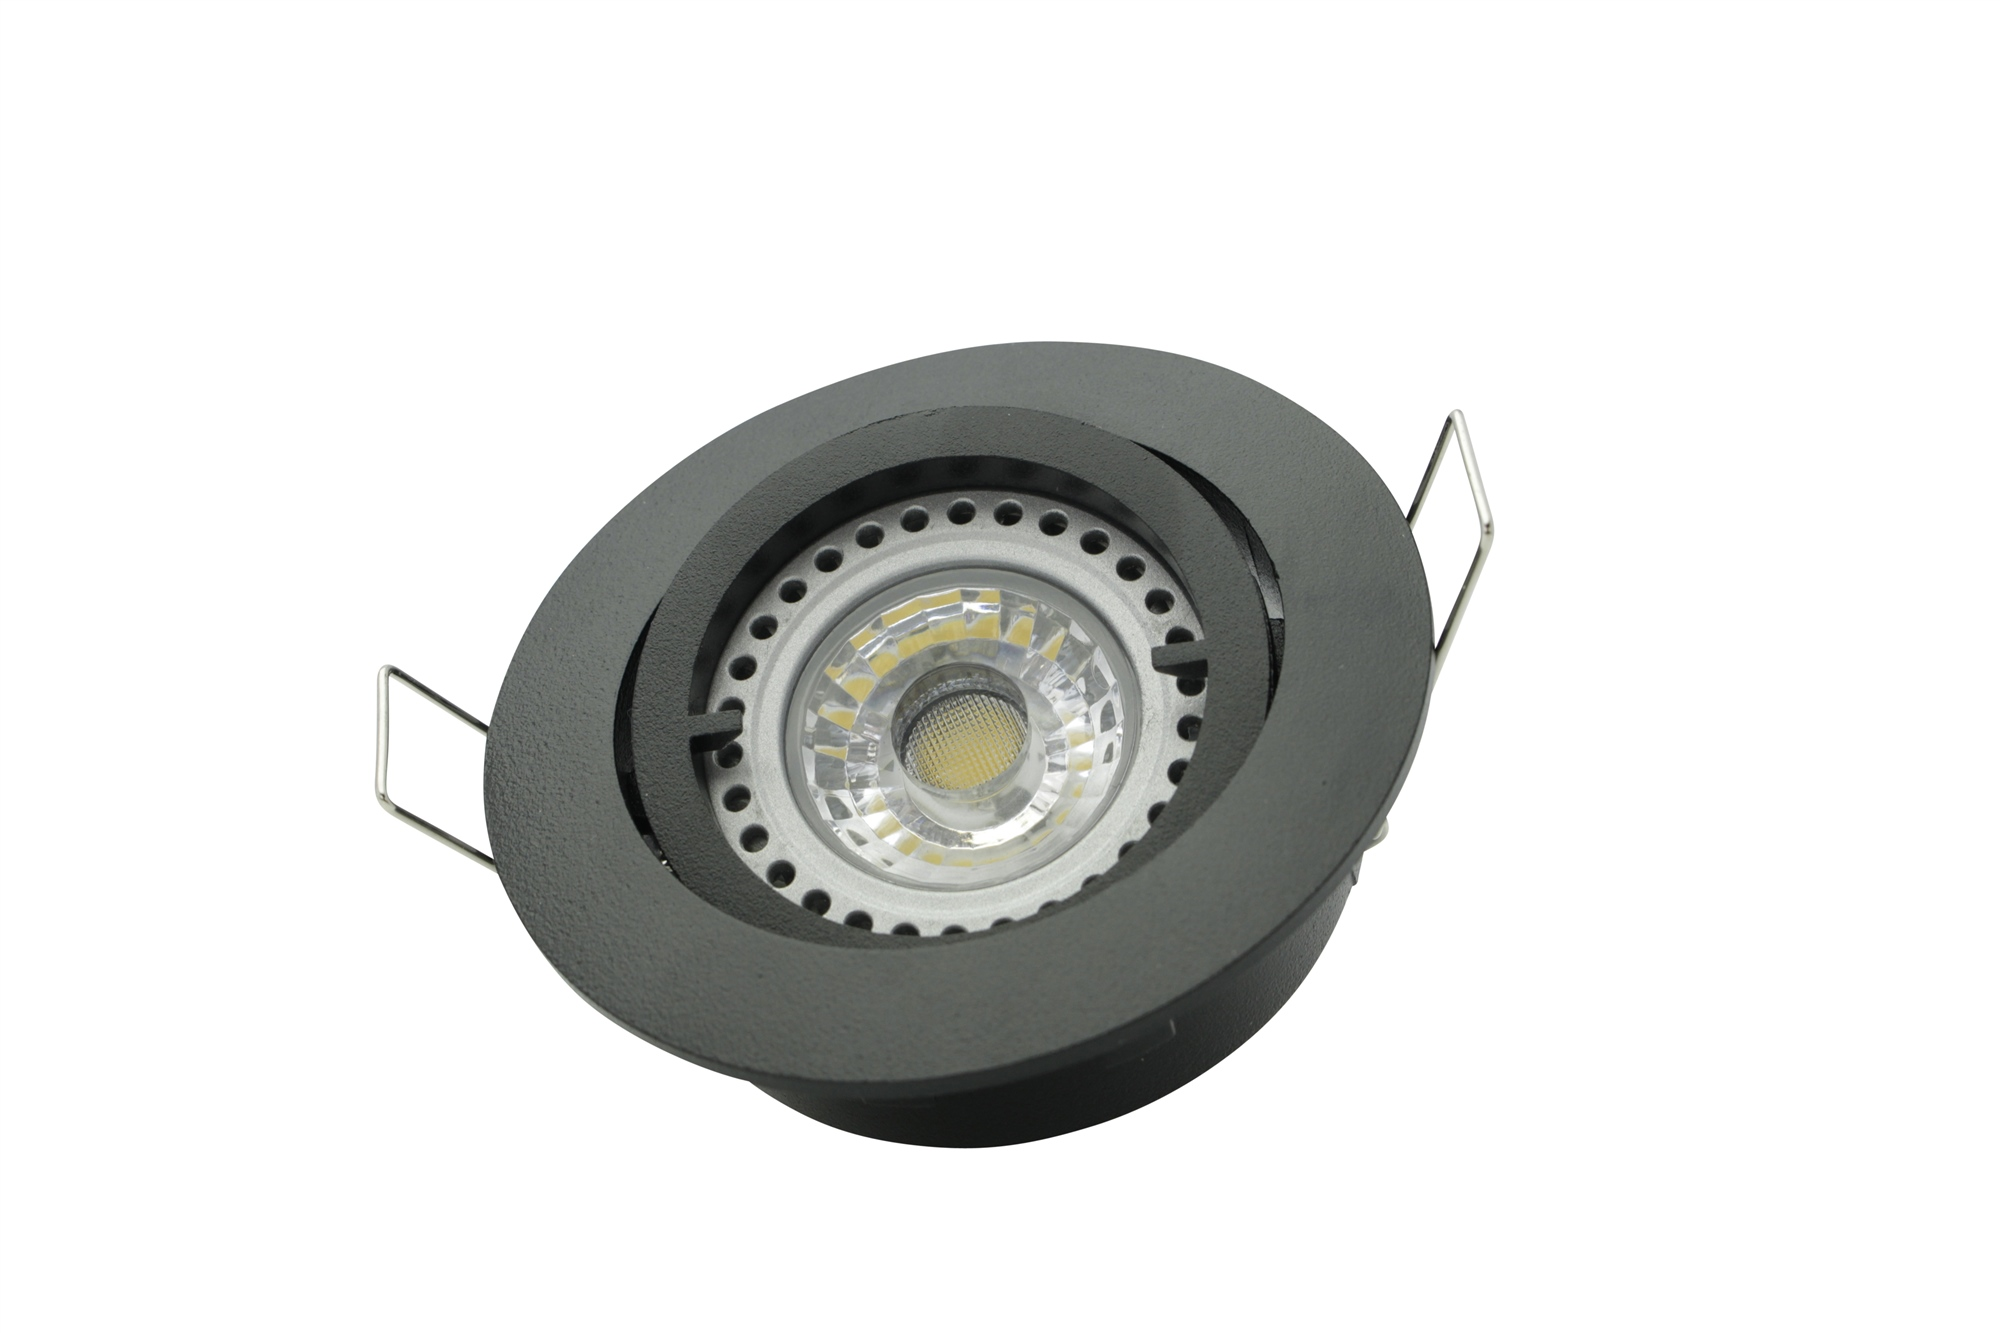 Lampenlux Einbaustrahler Samila Spot rund schwenkbar schwarz MR16 12V Aluminium